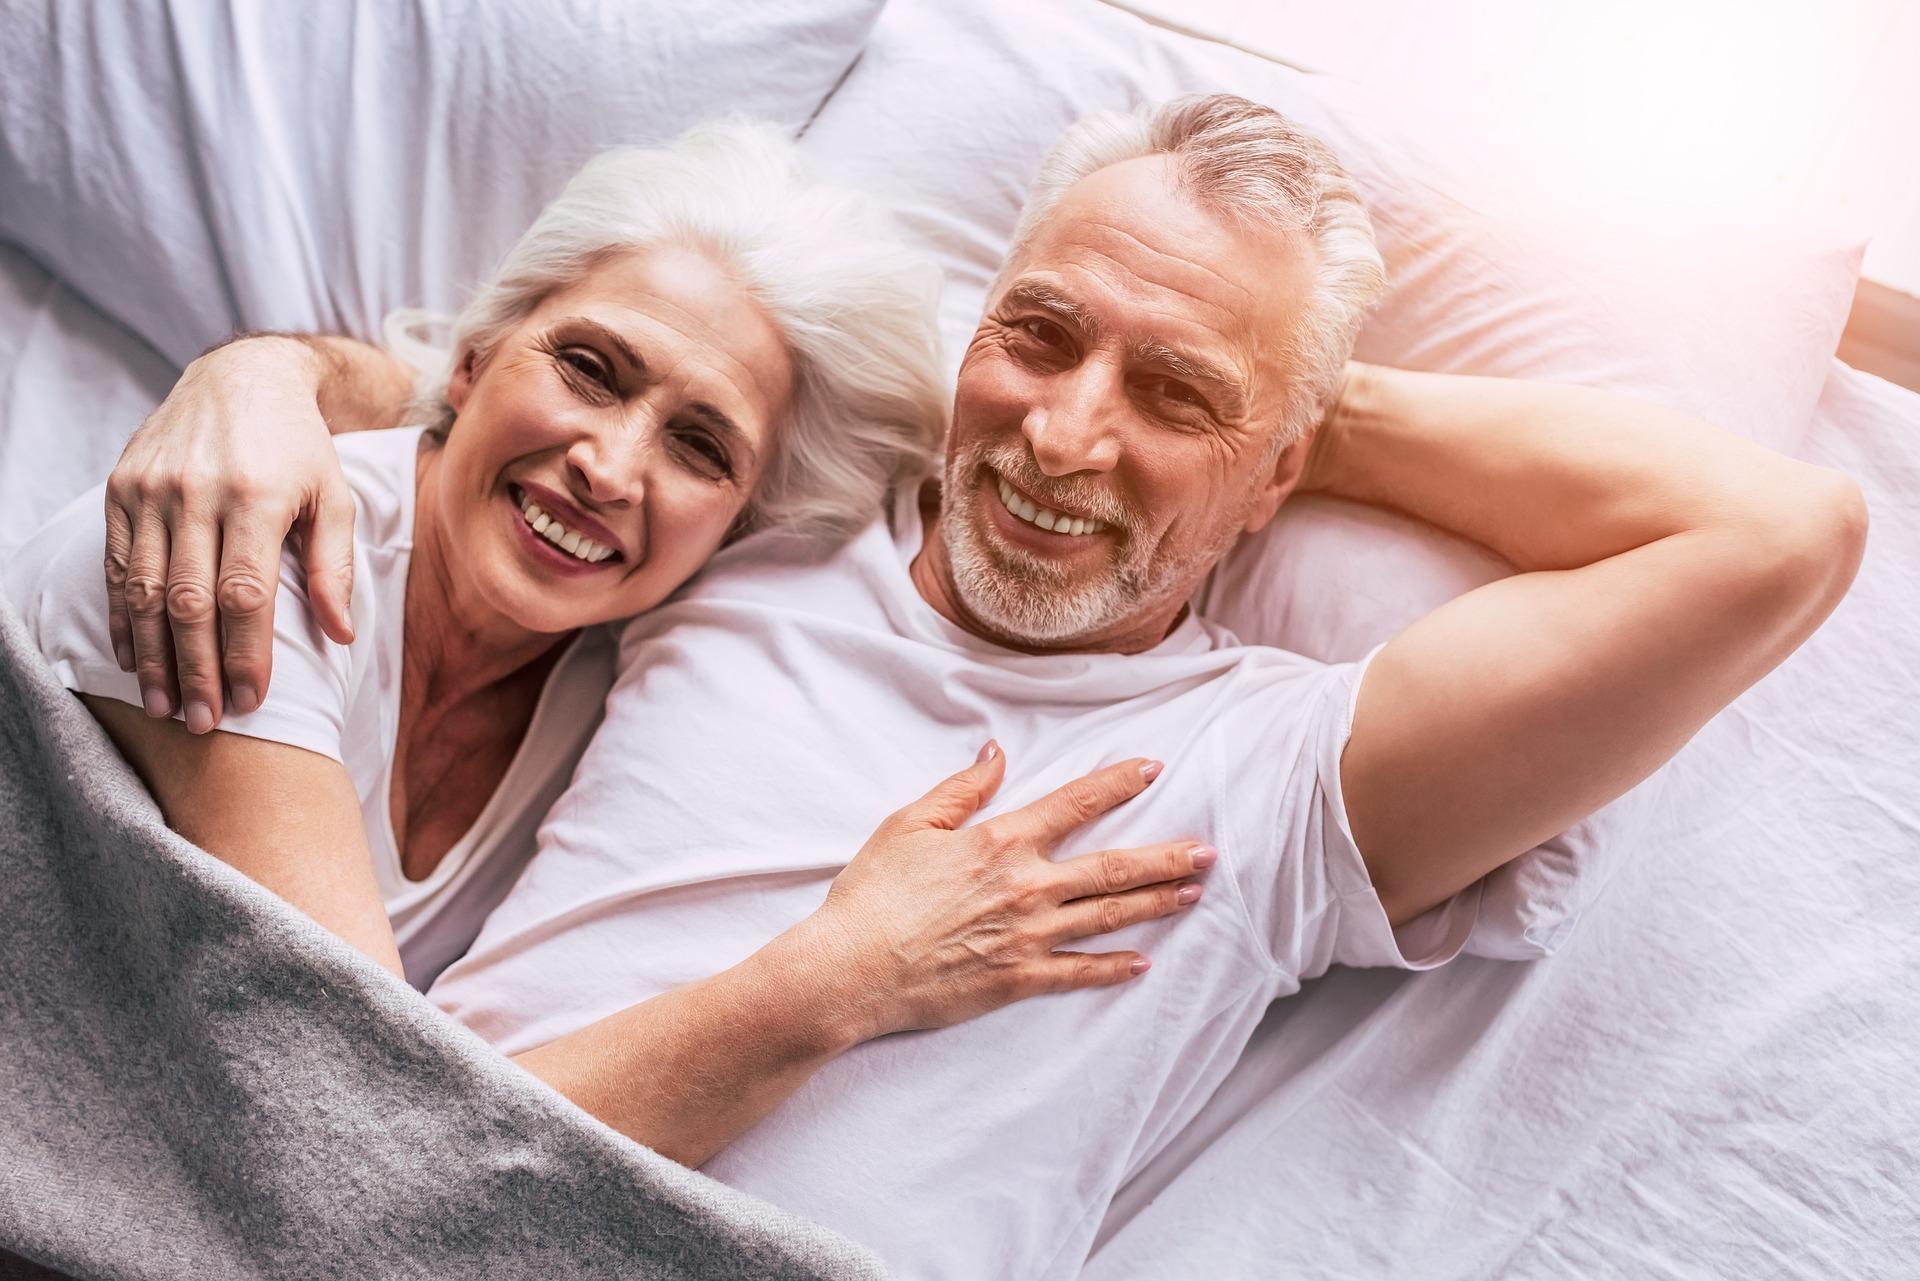 50 plus dating tips en sites